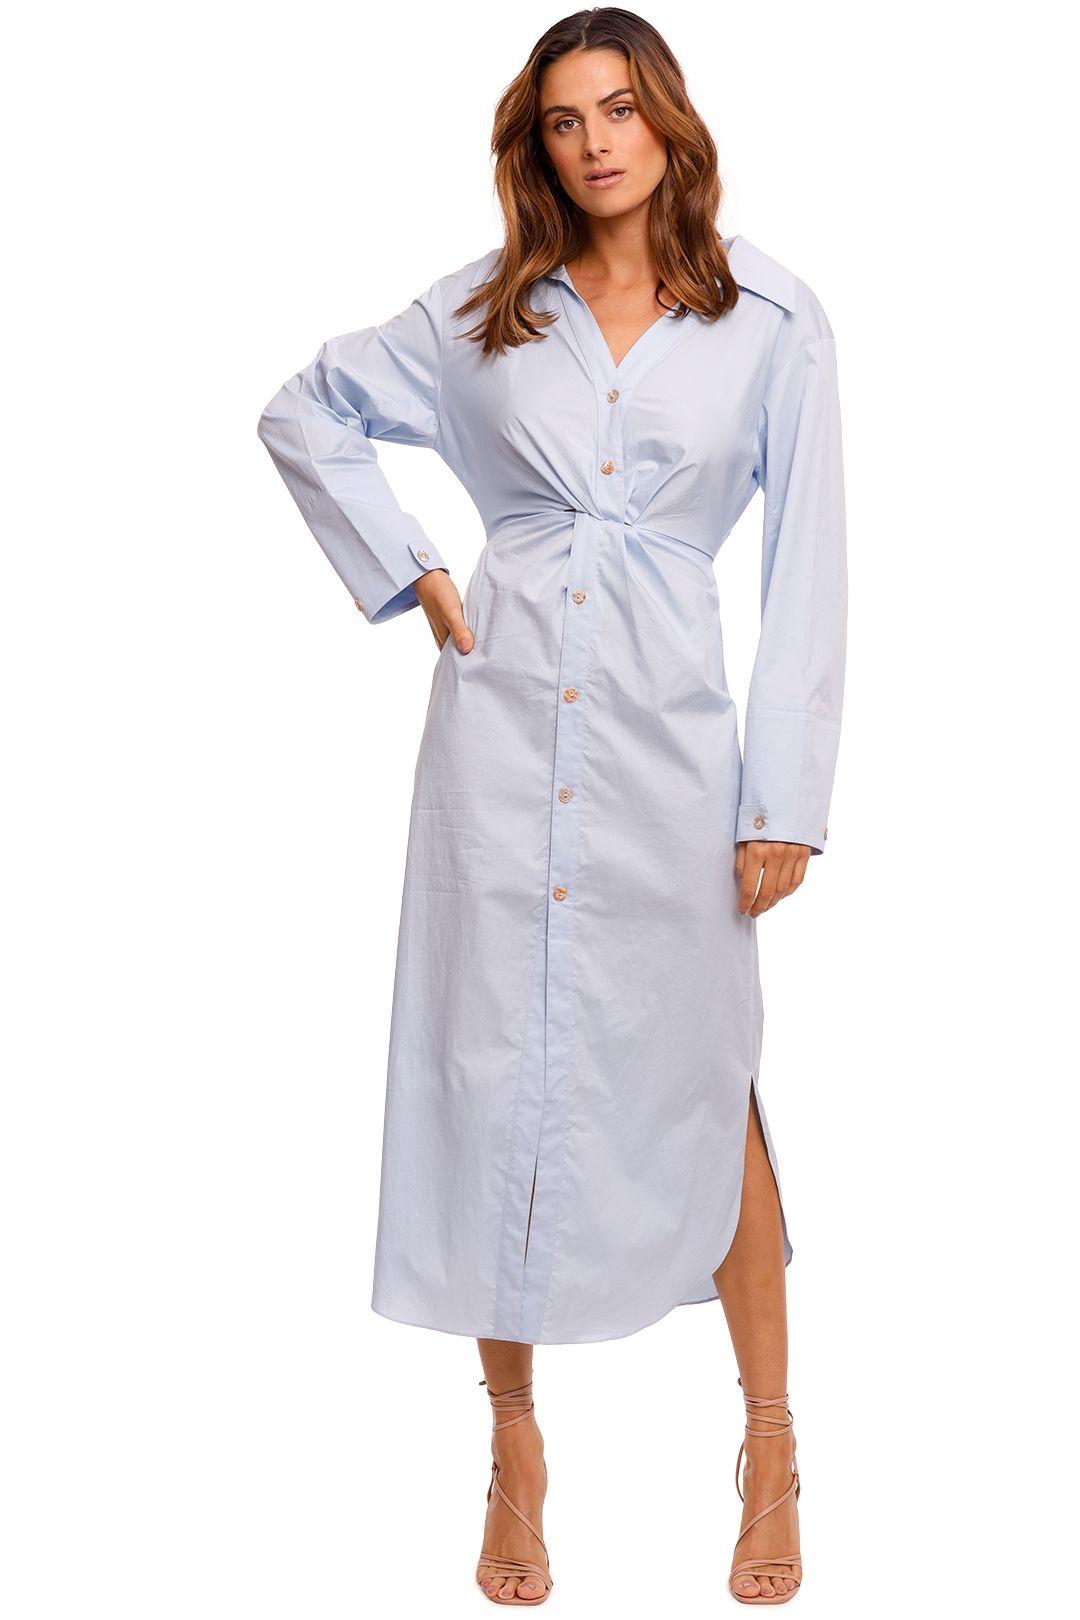 Nanushka Ayse Twisted Shirt Dress blue